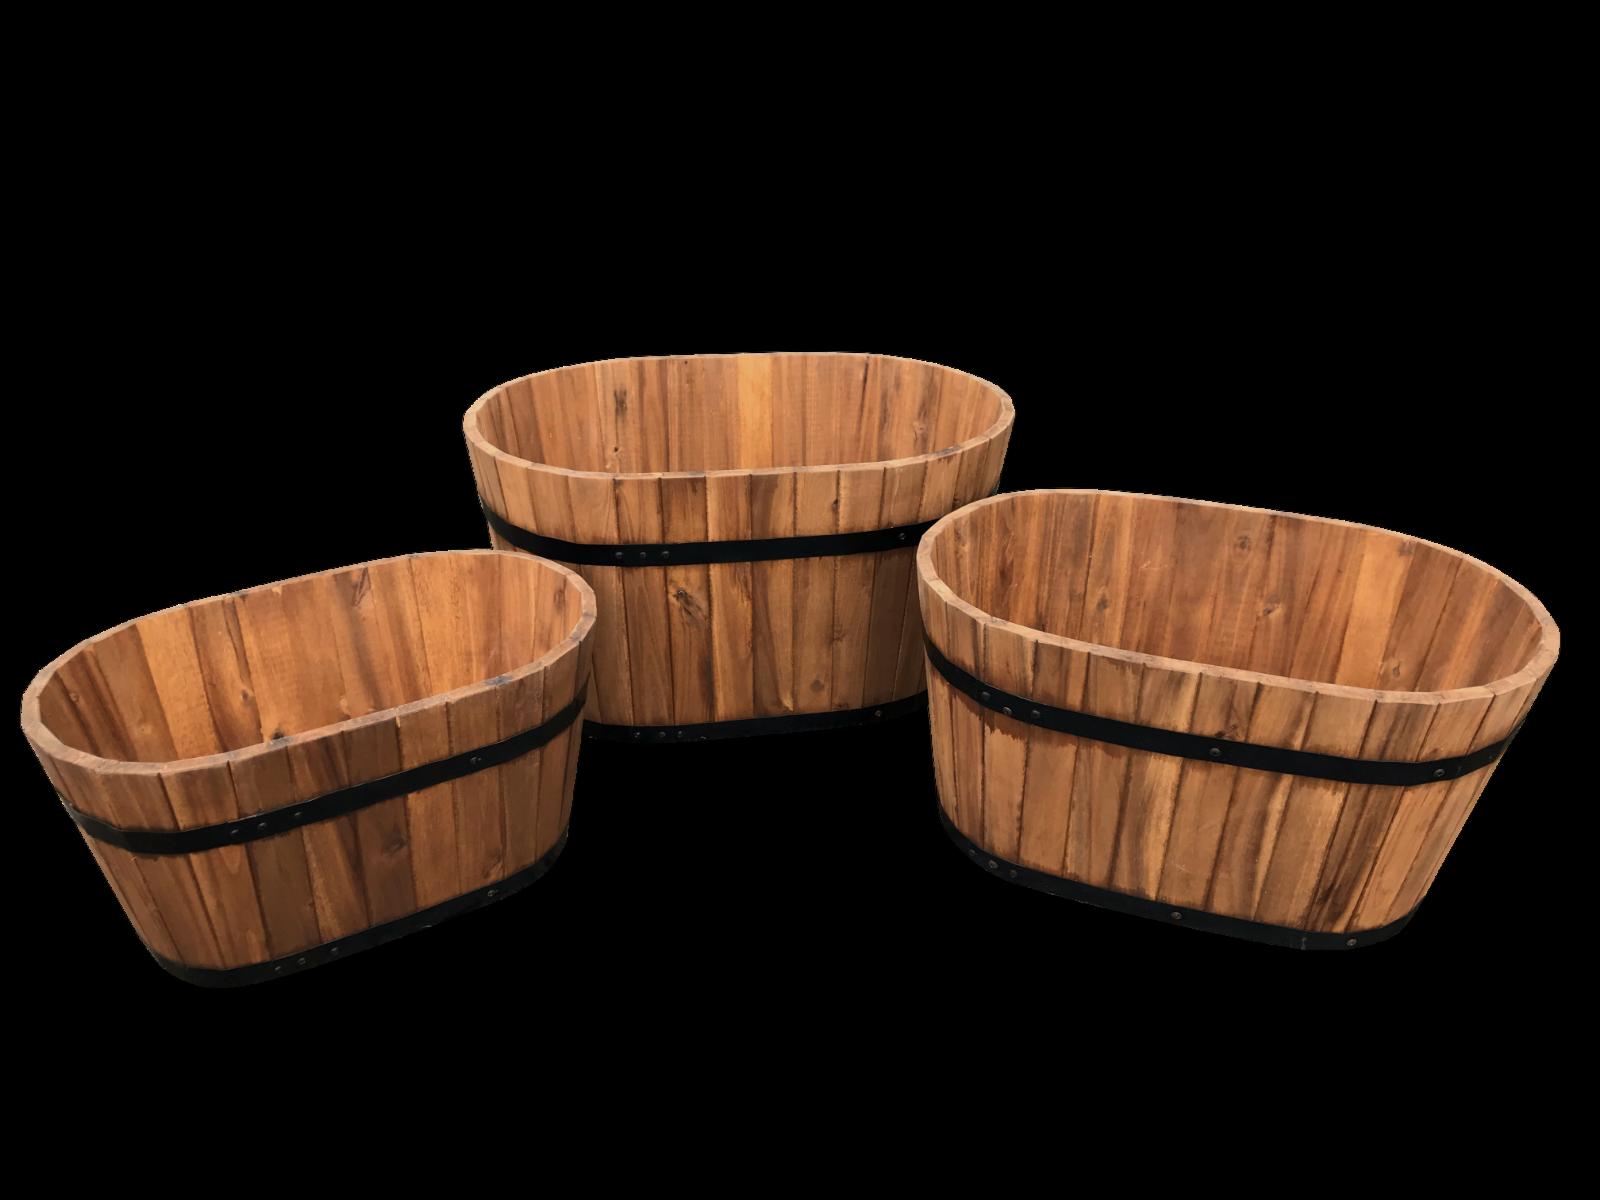 CLICK-DECK Wooden Hardwood Oval Garden Planters - Set of 3 Oval Flower Tub Pot